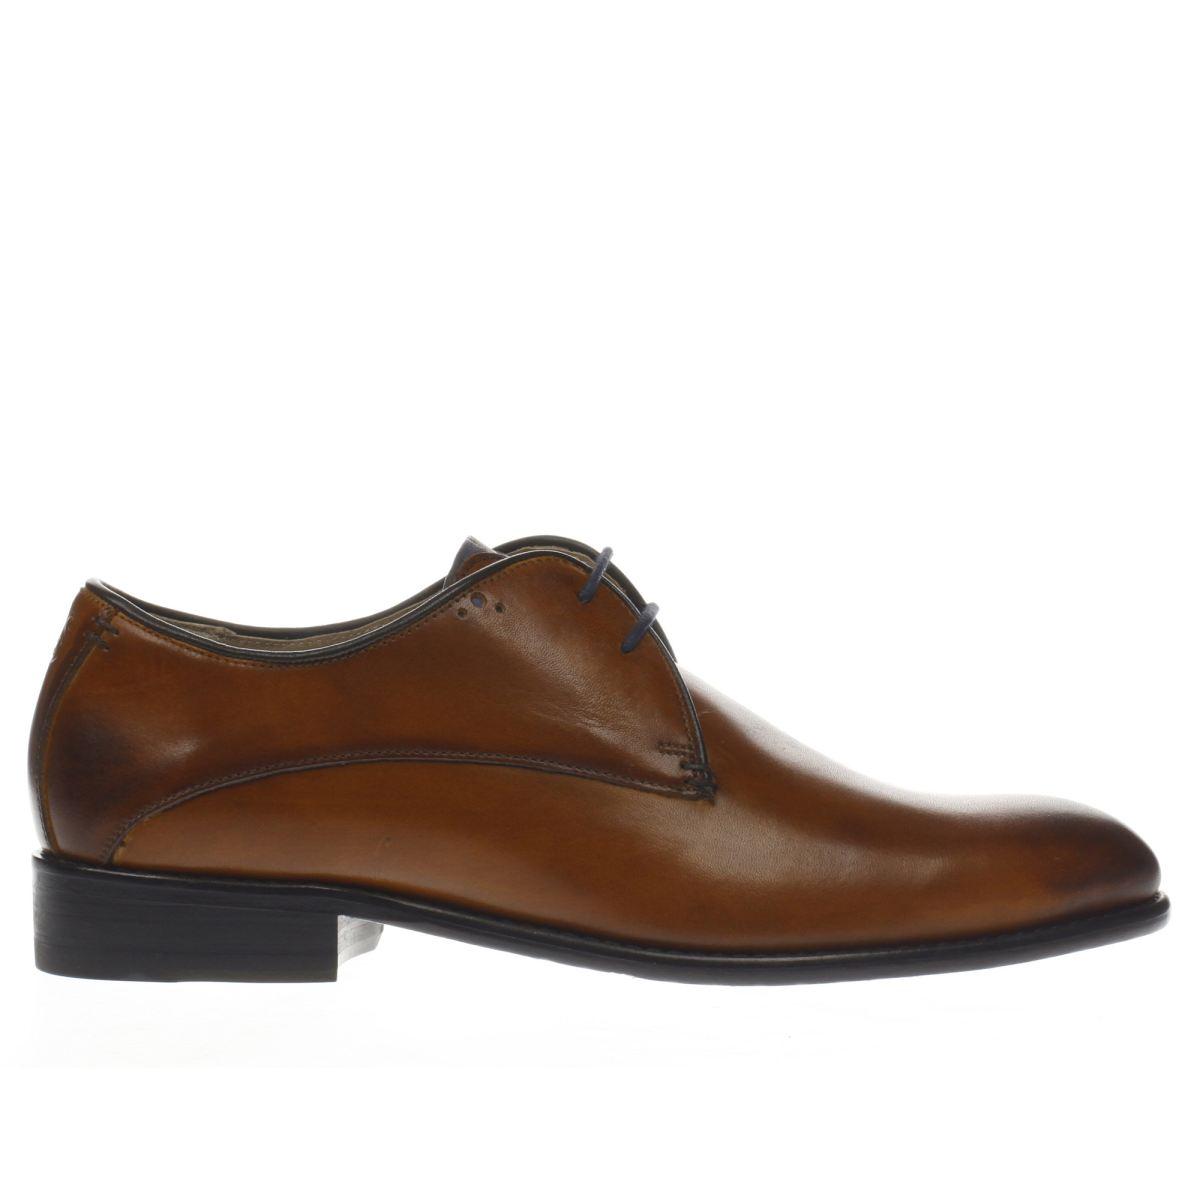 Oliver Sweeney Oliver Sweeney Tan Knole Shoes